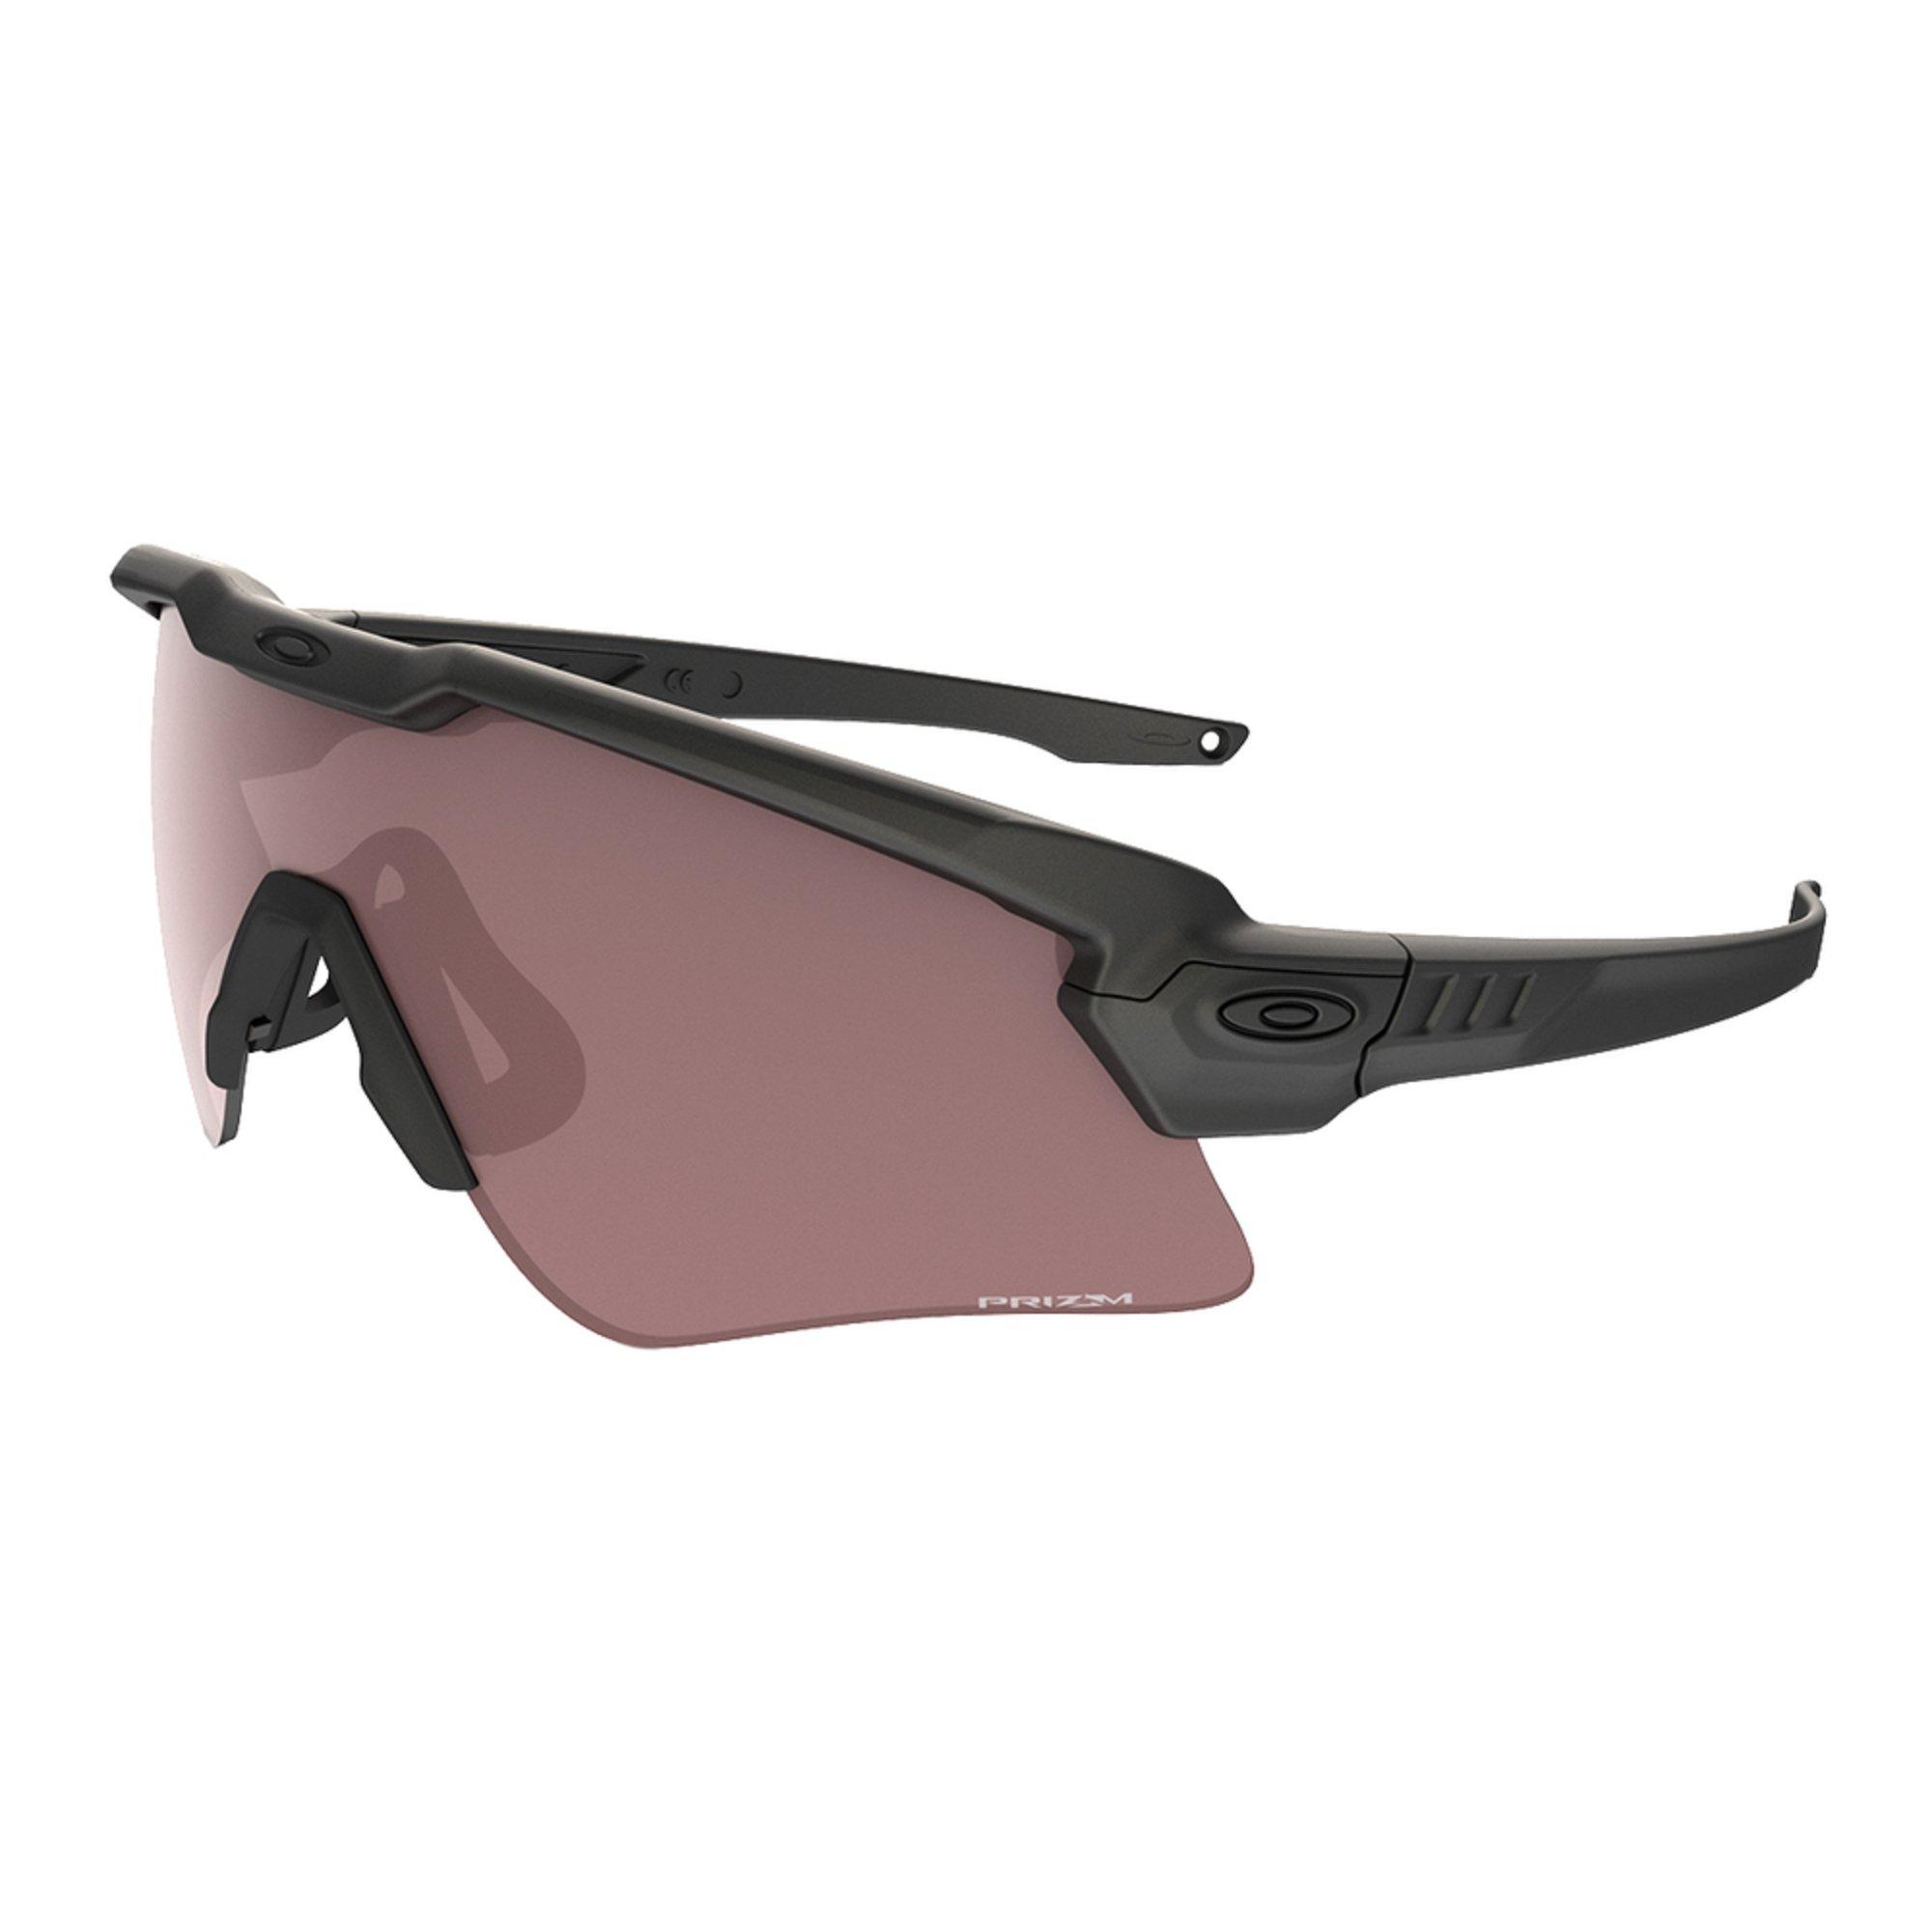 c00d0828684 Oakley. Oakley Men s Standard Issue Ballistic Apha Sunglasses